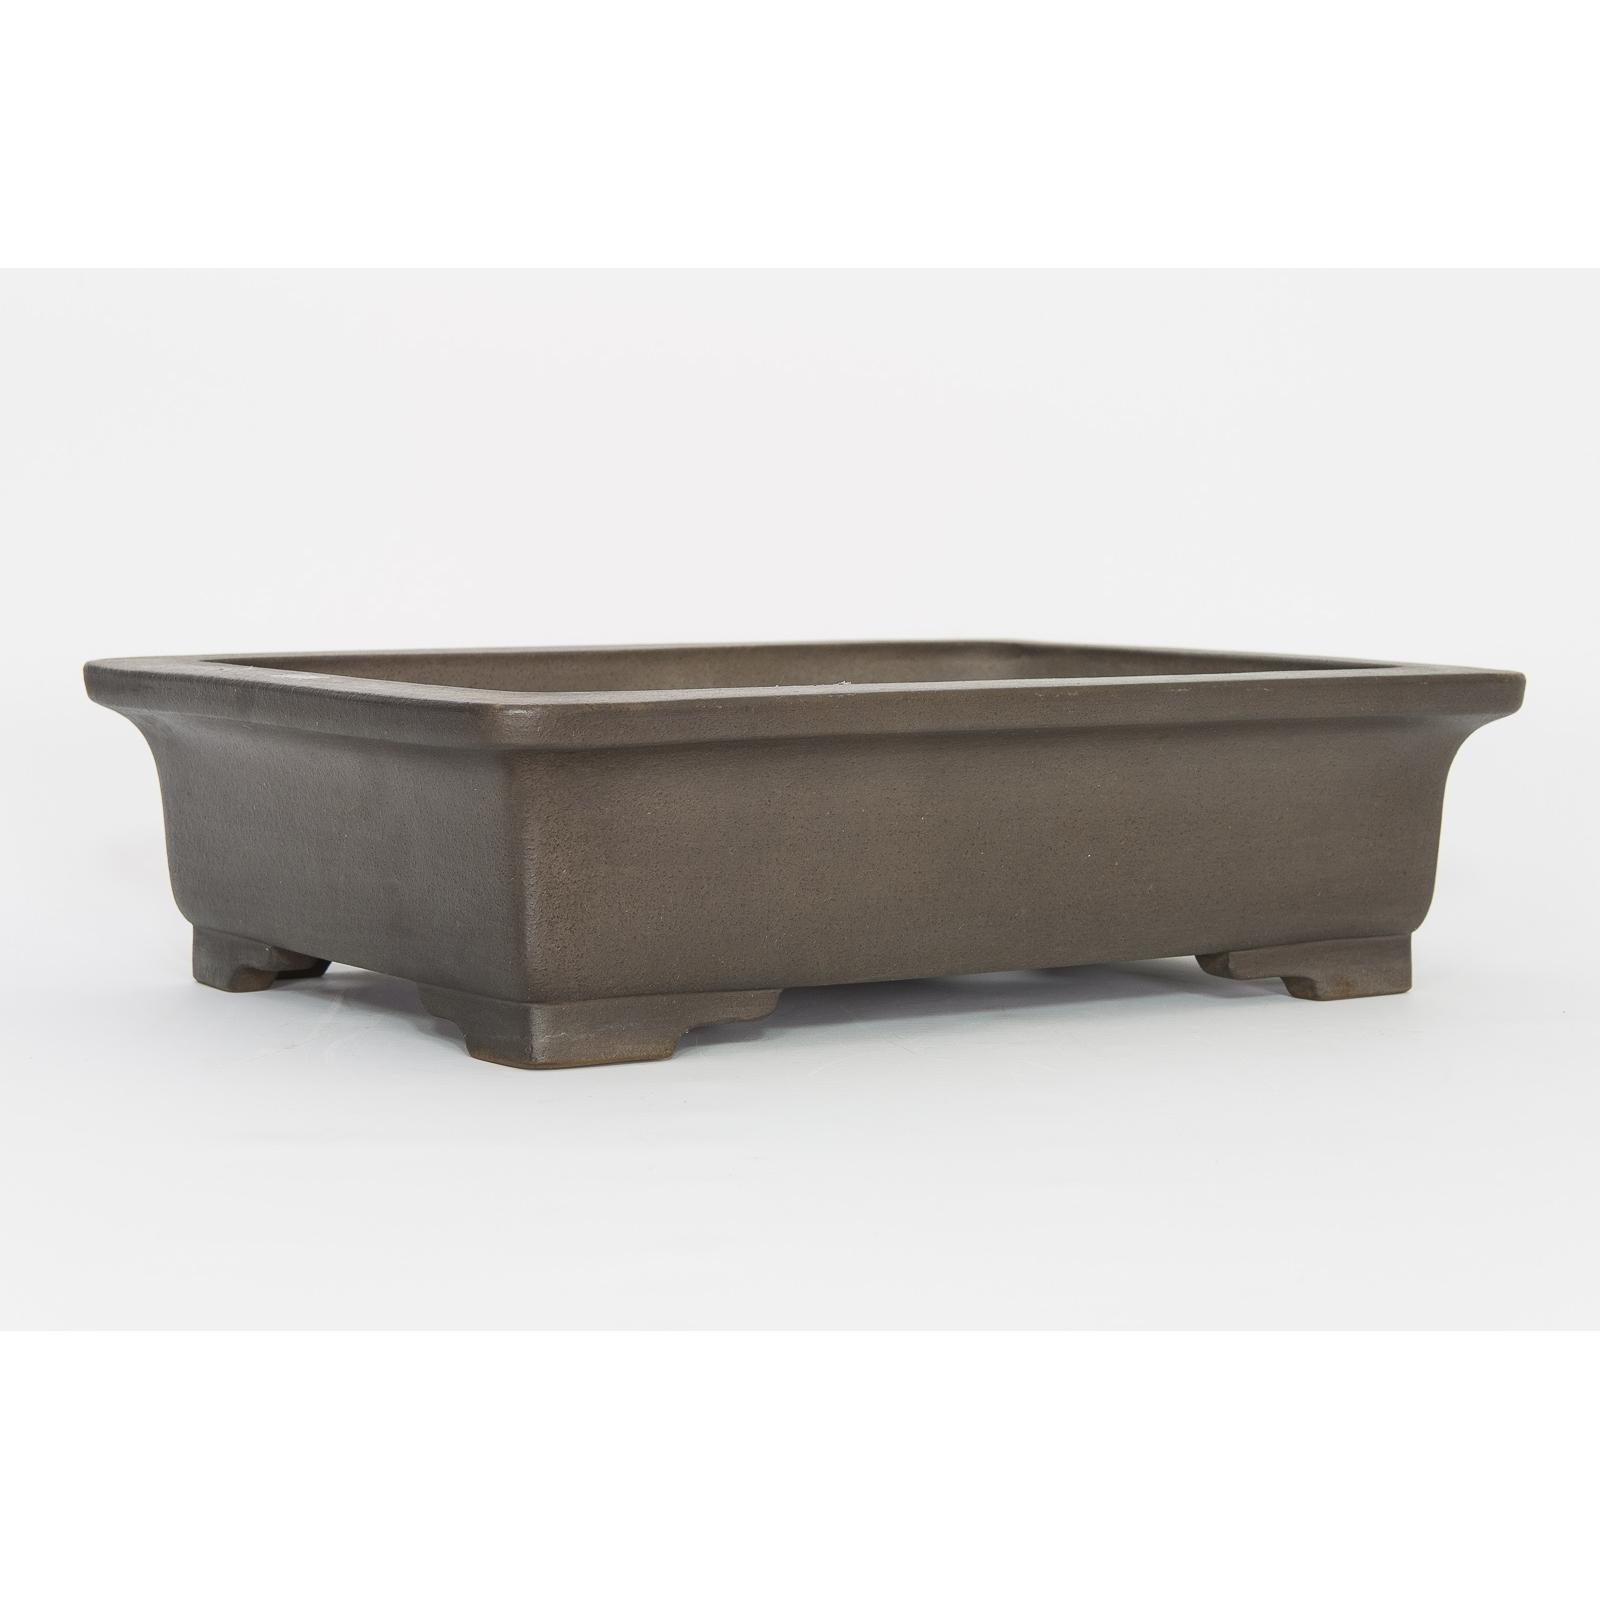 Pot used U-0001